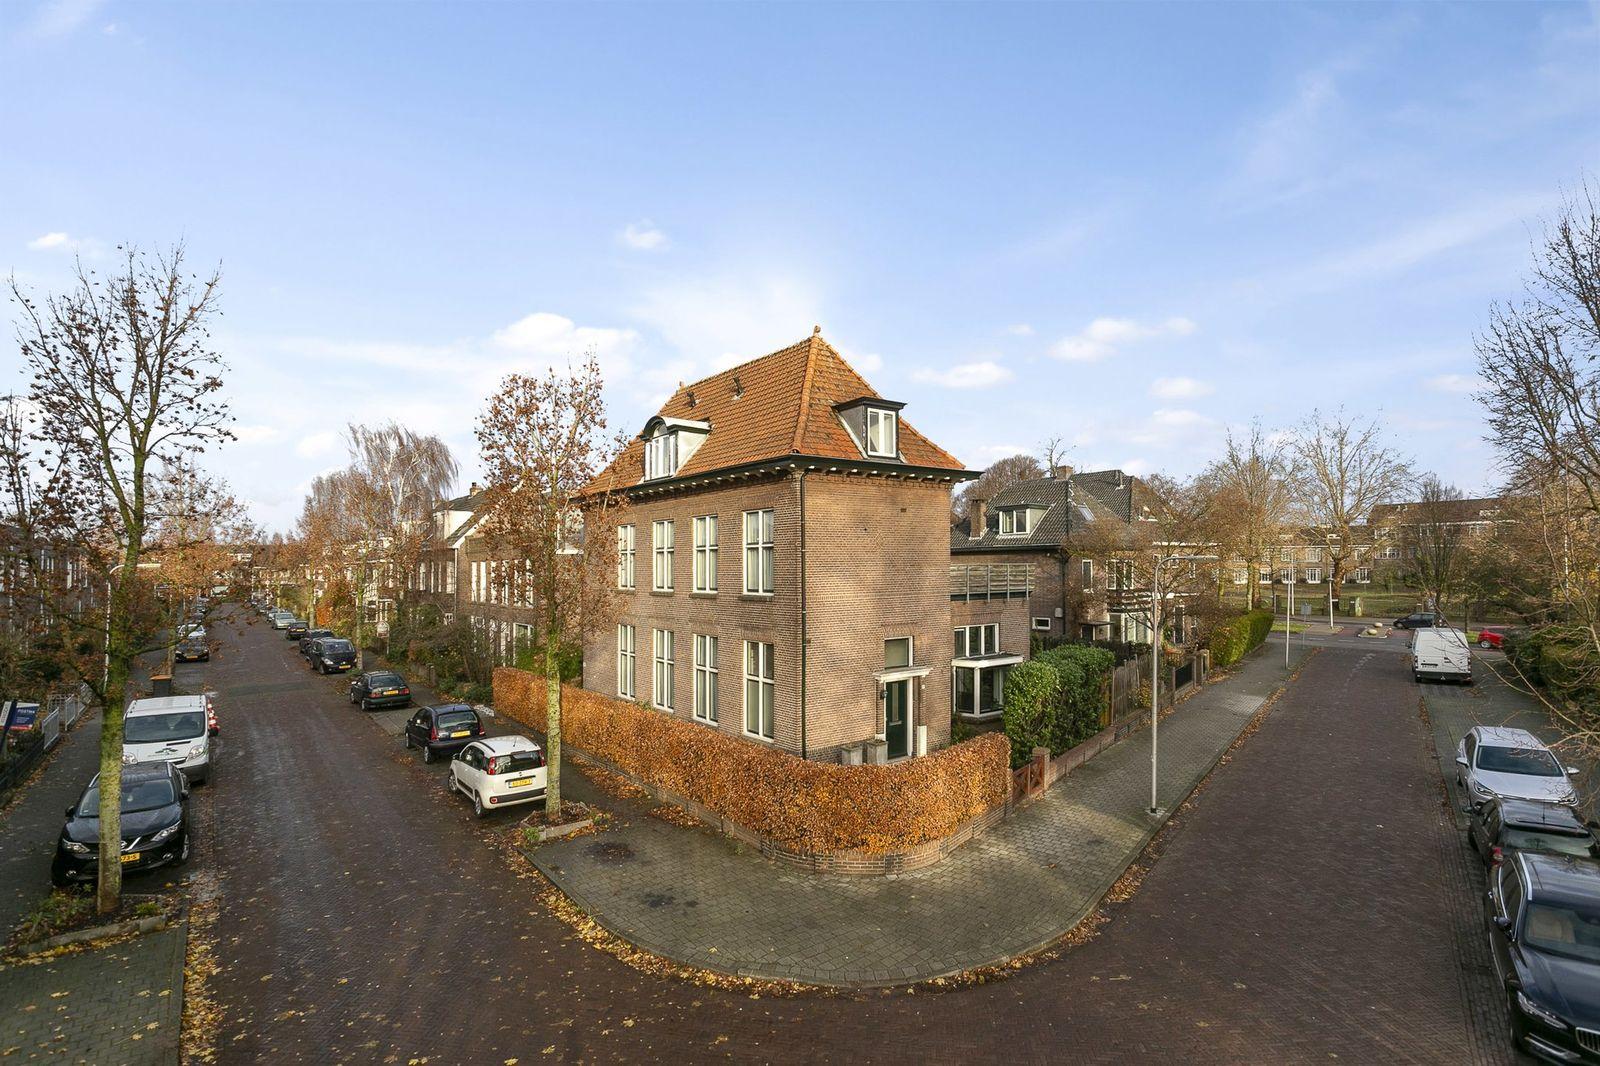 A.J. Duymaer van Twiststraat 14, Deventer